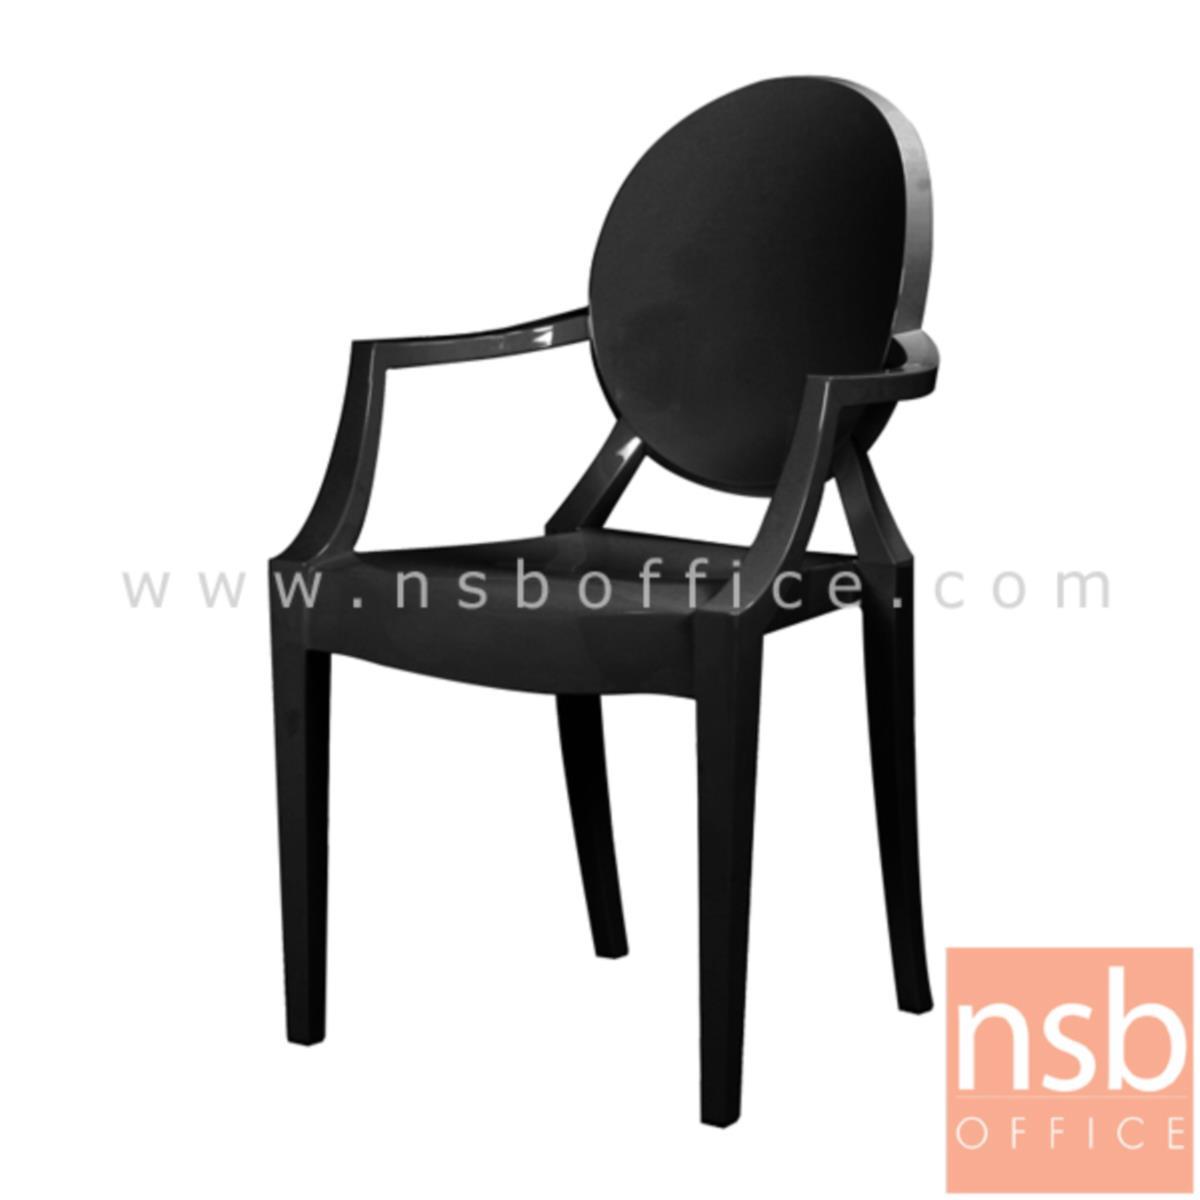 B29A079:เก้าอี้โมเดิร์นพลาสติกเงา(PC)ล้วน รุ่น PP9221 ขนาด 53W cm.